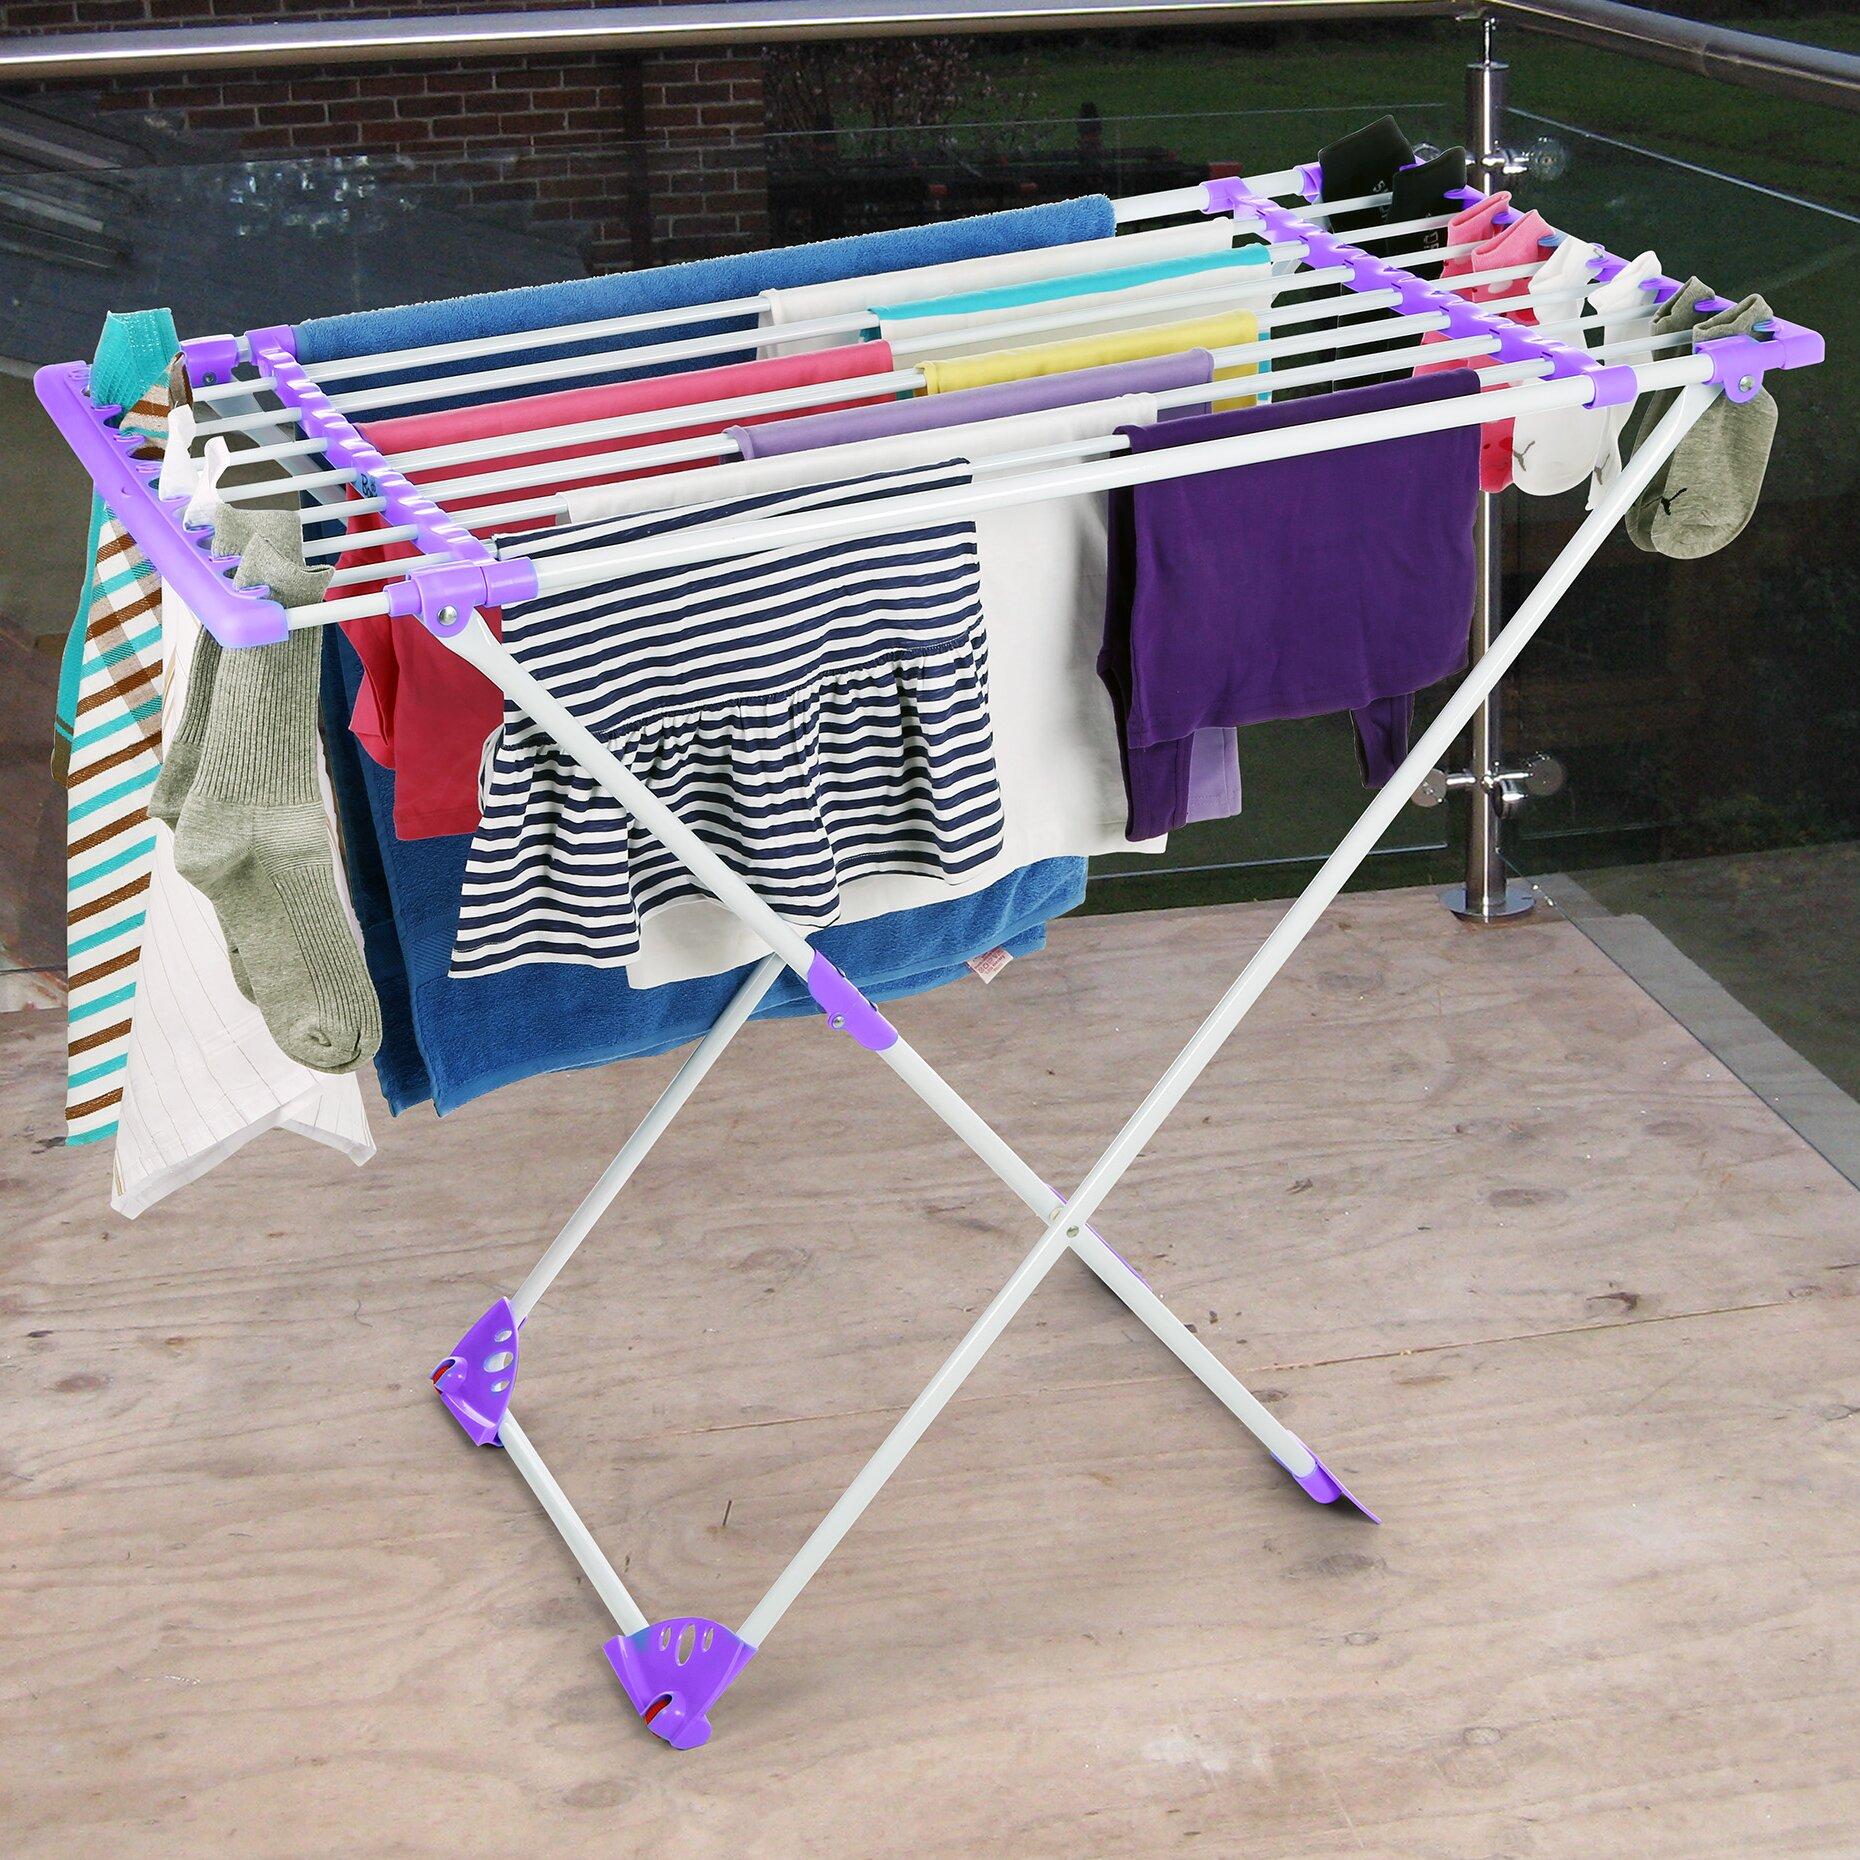 Bonita Flexy Clothes Dryer Stand amp Reviews Wayfair : Bonita Flexy Clothes Dryer Stand CD10 40PU from www.wayfair.com size 1860 x 1860 jpeg 1012kB